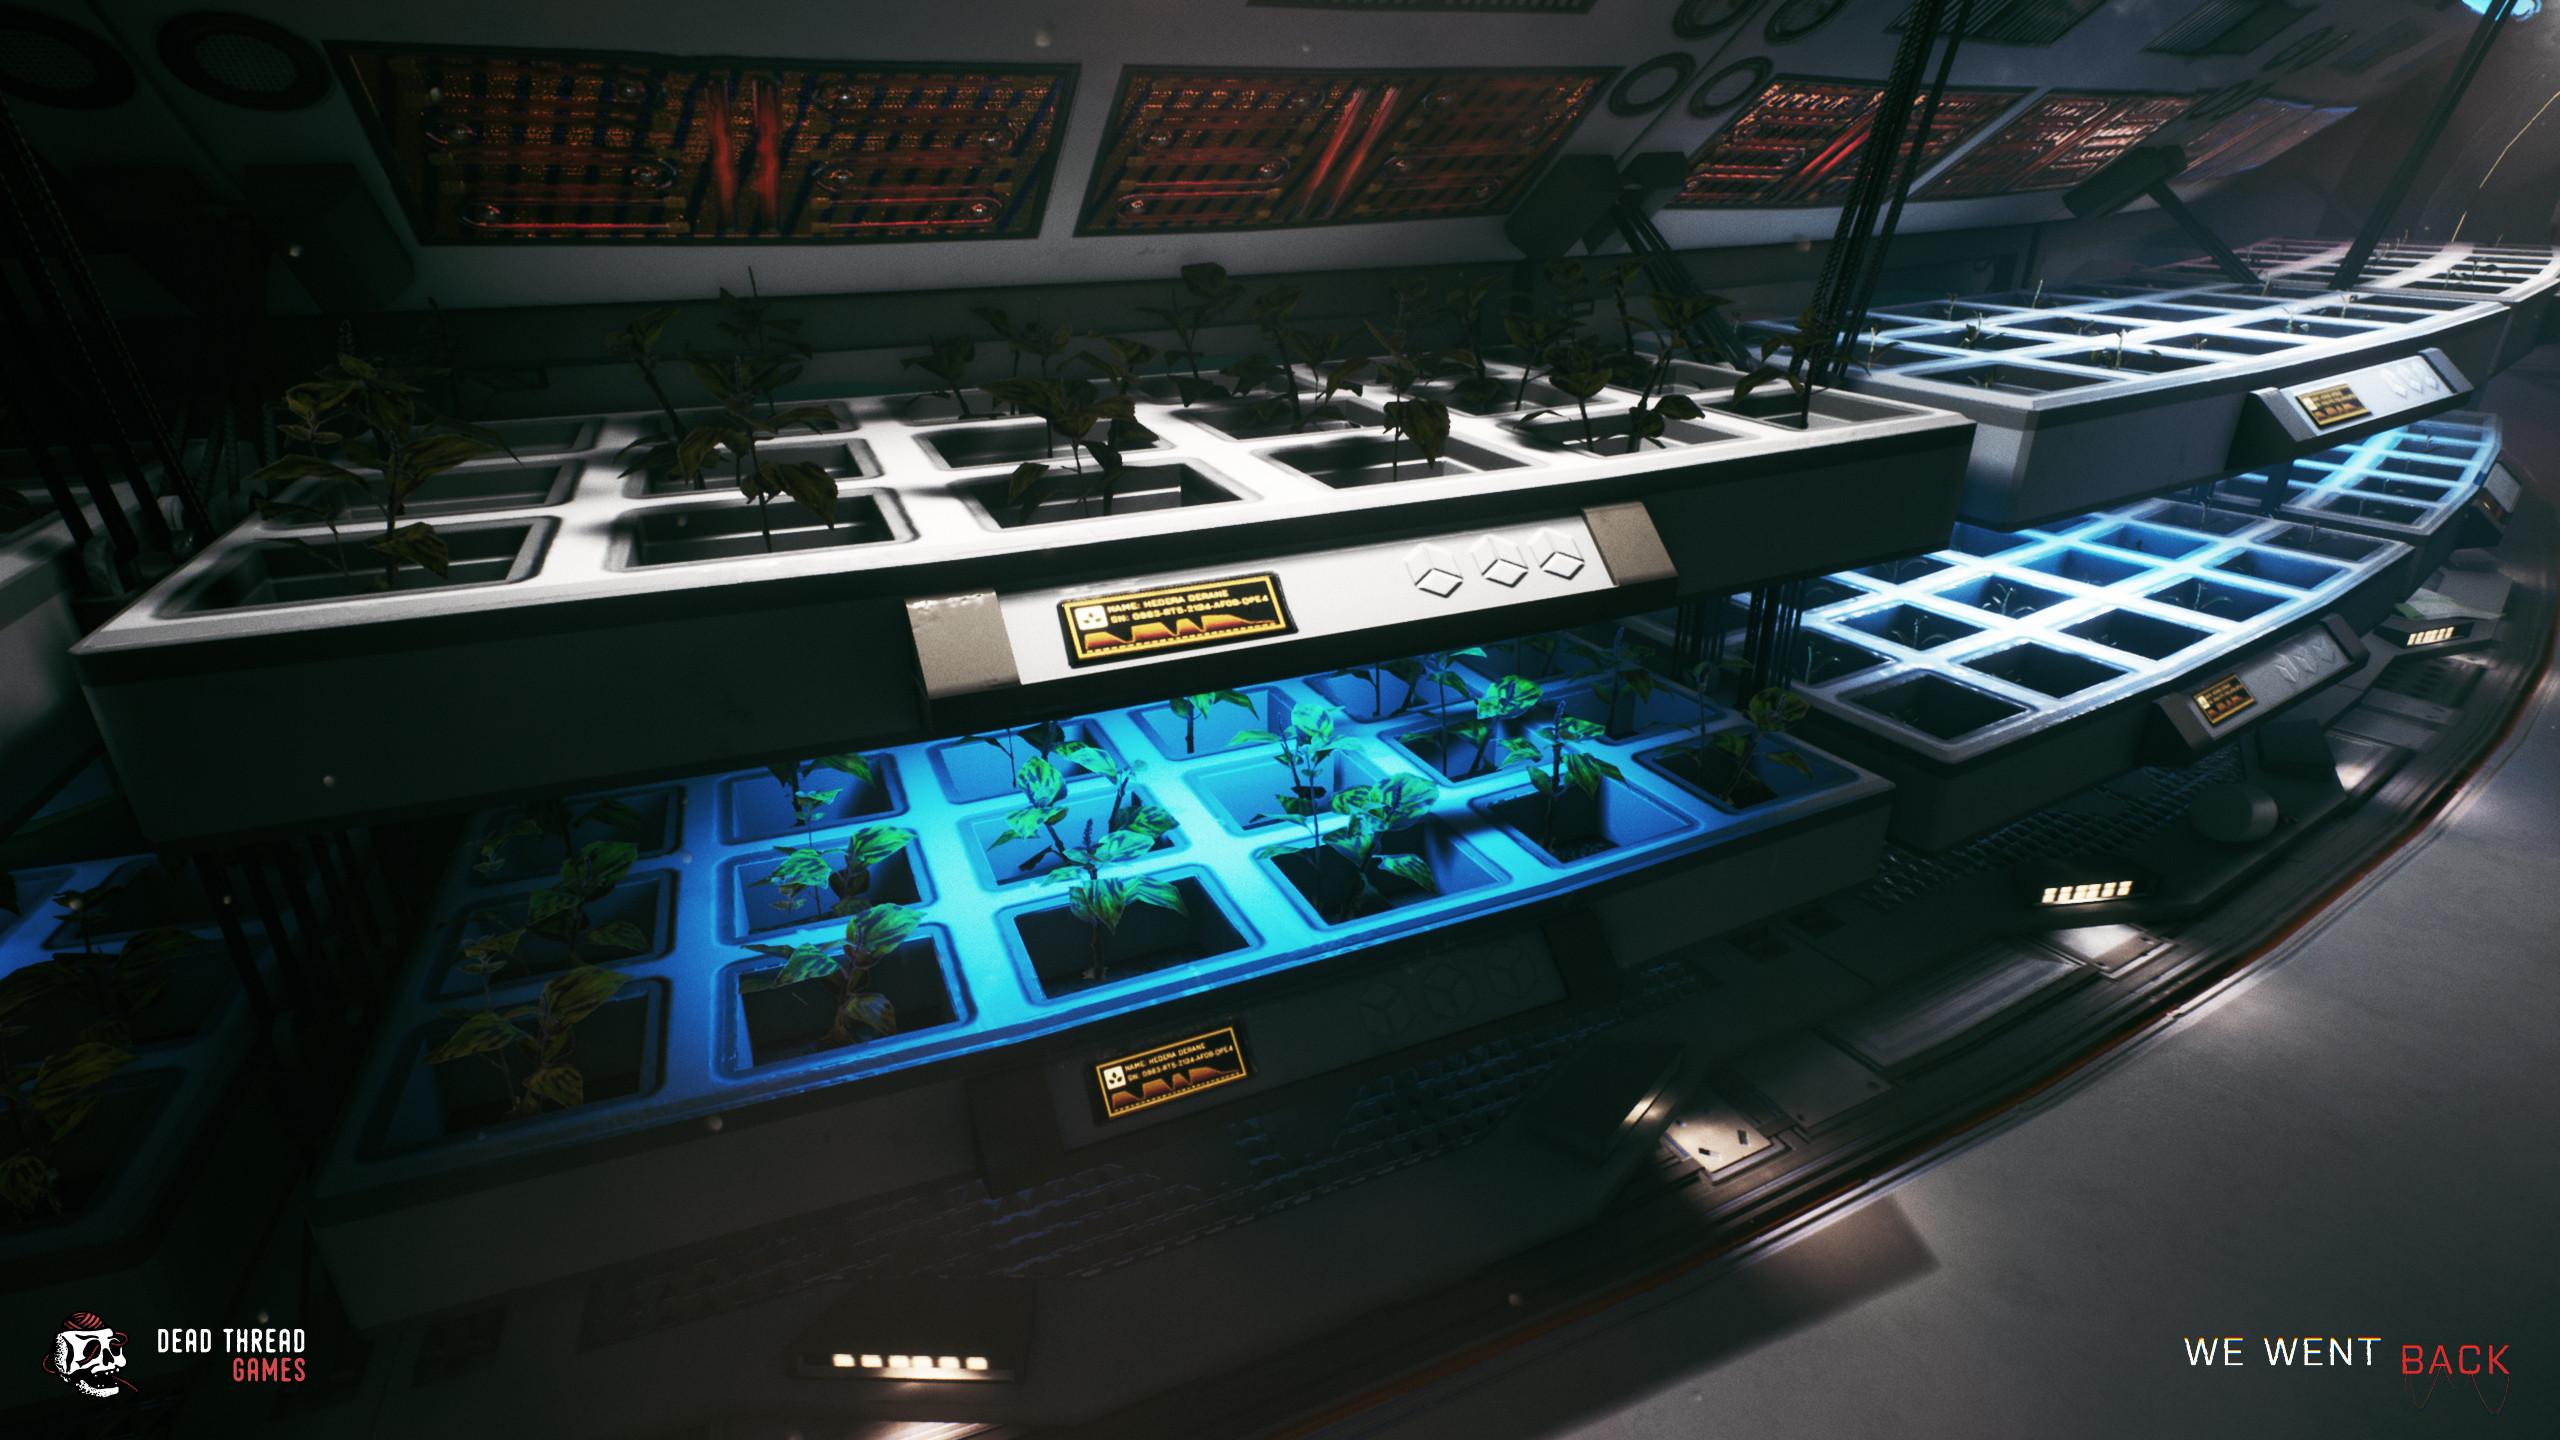 In game hydroponics room screens.